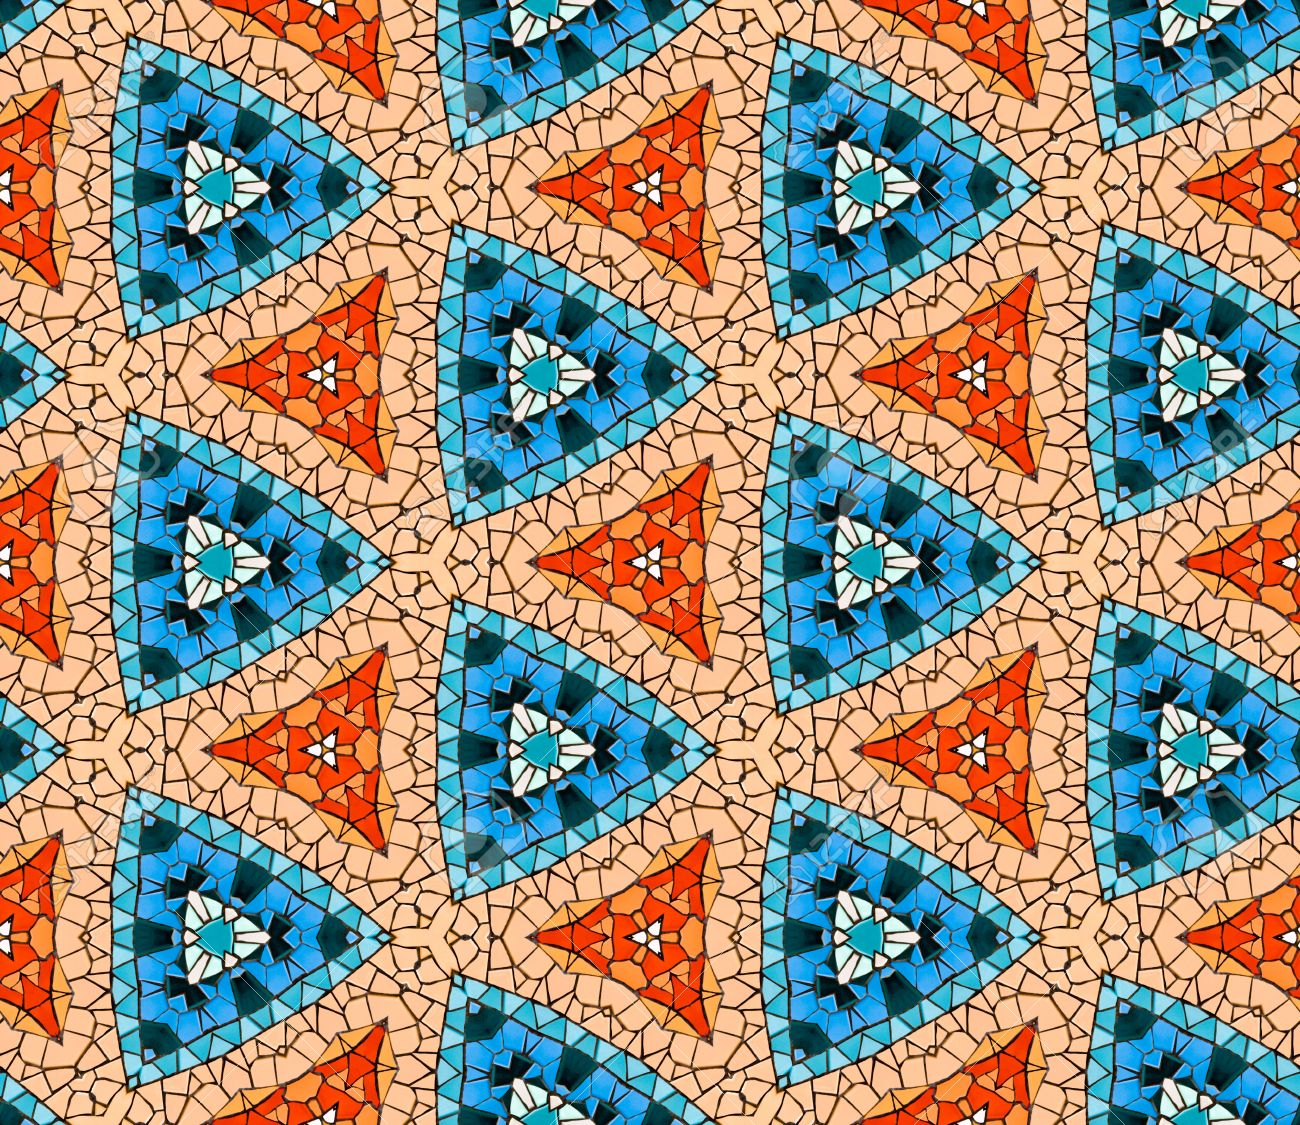 nahtlose gefliesten mosaik muster von kaleidoskopischen vernderten sechseckige echte keramische fliesen angeordnet bunten dreieck formen - Mosaik Muster